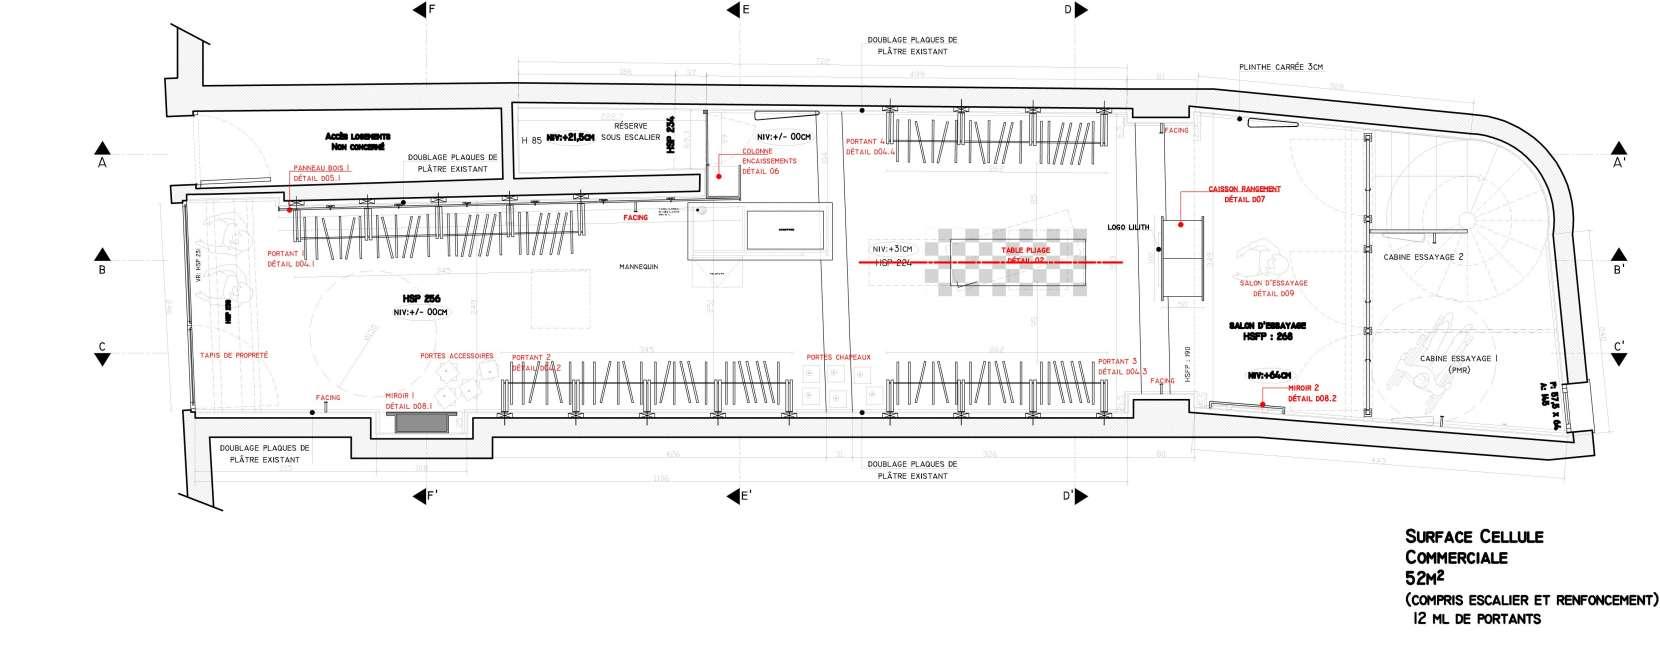 PCG-31-01-2012-PCG-02-Aménagement-A3.jpg